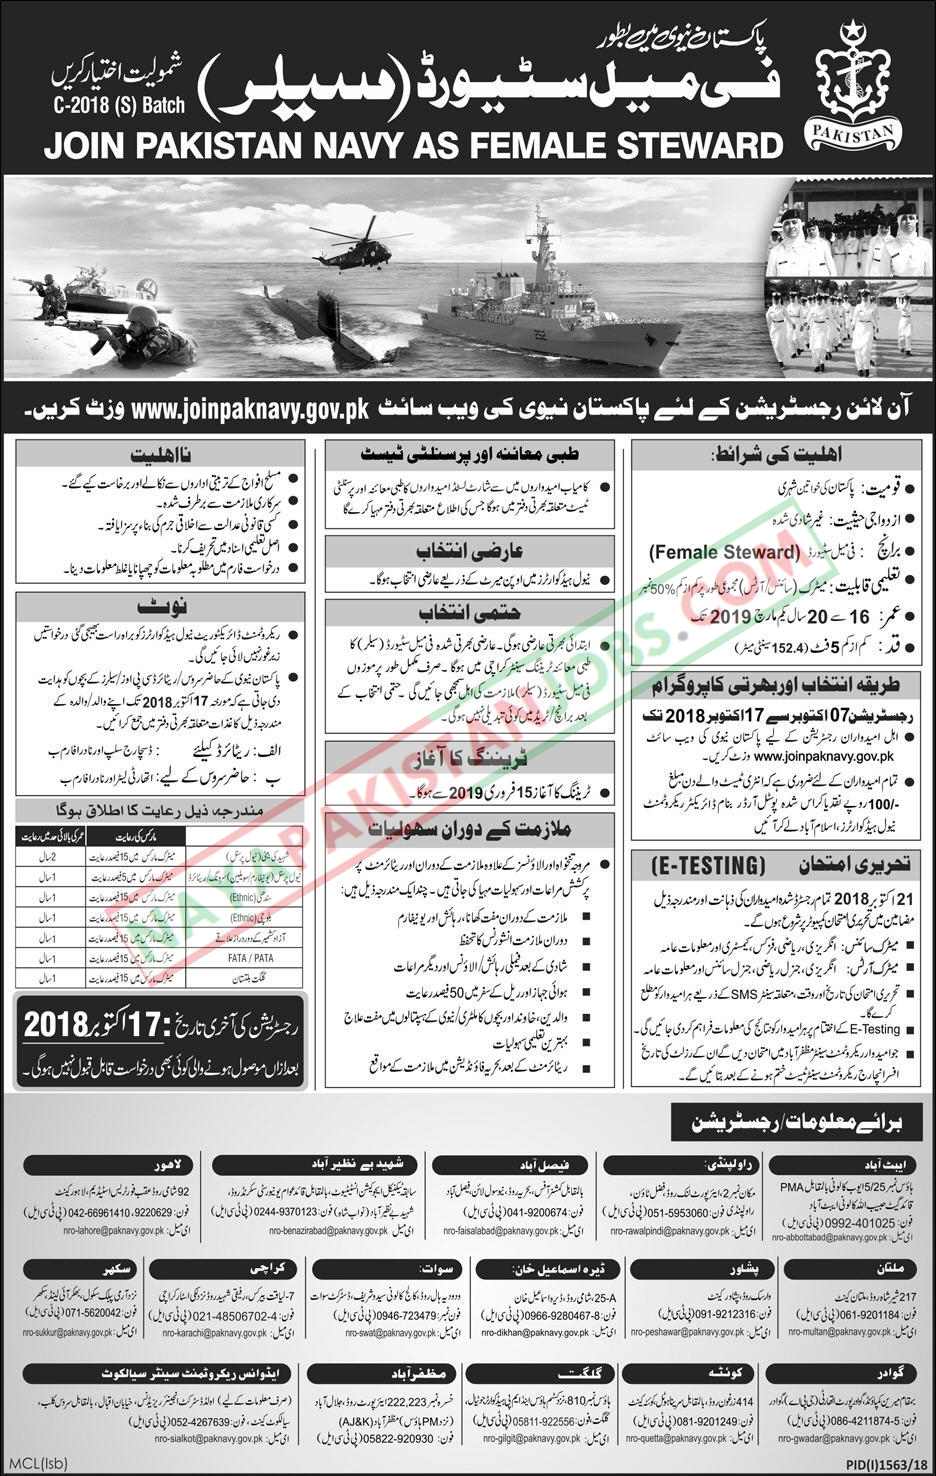 Join pak navy, pak navy female jobs 2018, join pak navy as female steward 2018, Join pak navy for female jobs 2018